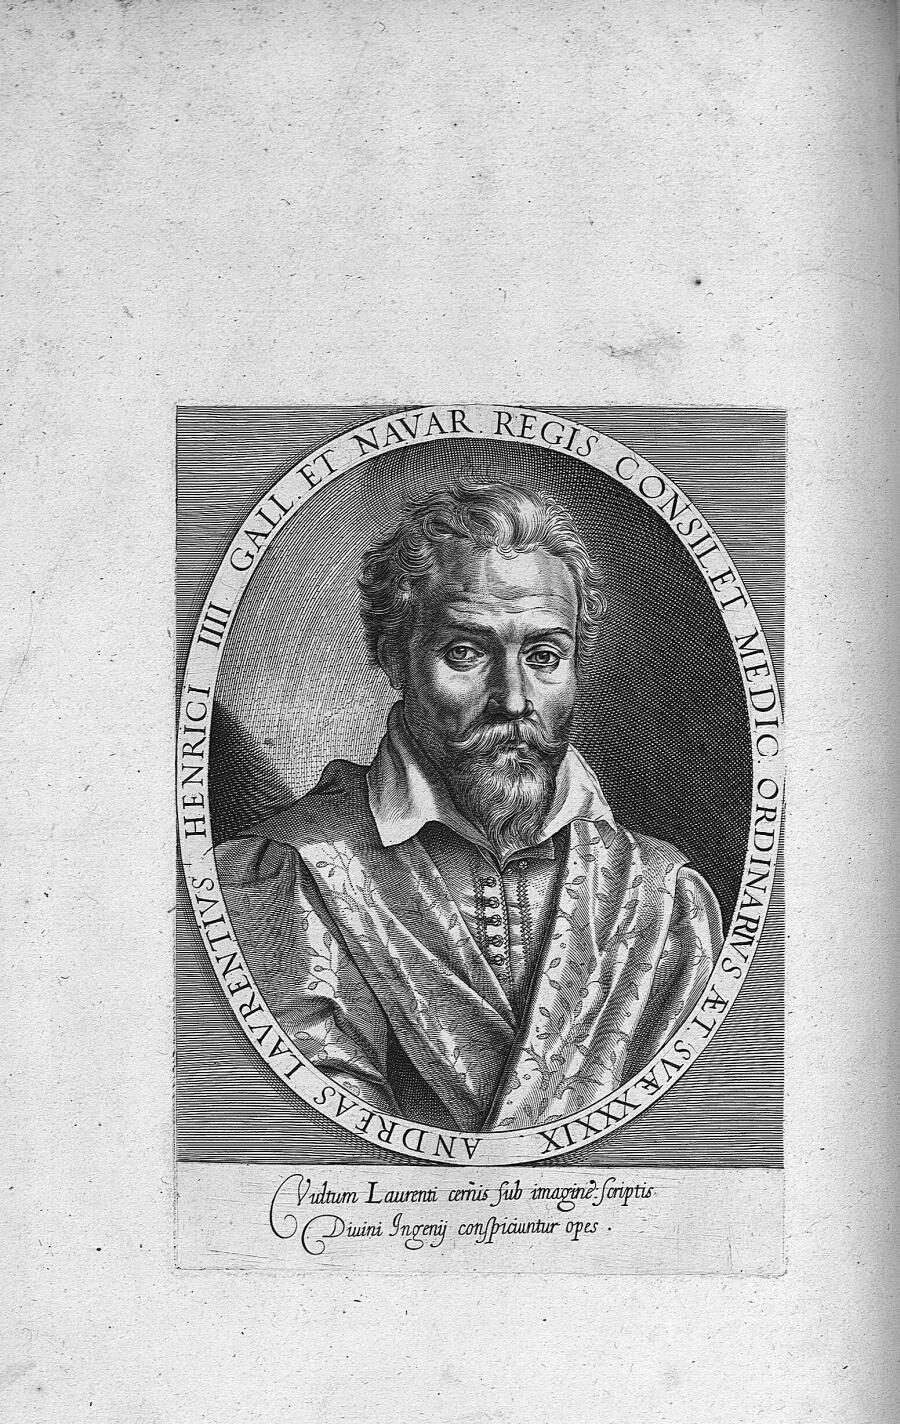 Andreas Laurentius Henrici IIII Gall. et Navar. regis consil. et medic. ordinarius aet. suae XXXIX - [...] - Médecins. 16e siècle, 17e siècle (France) - med00276x0030